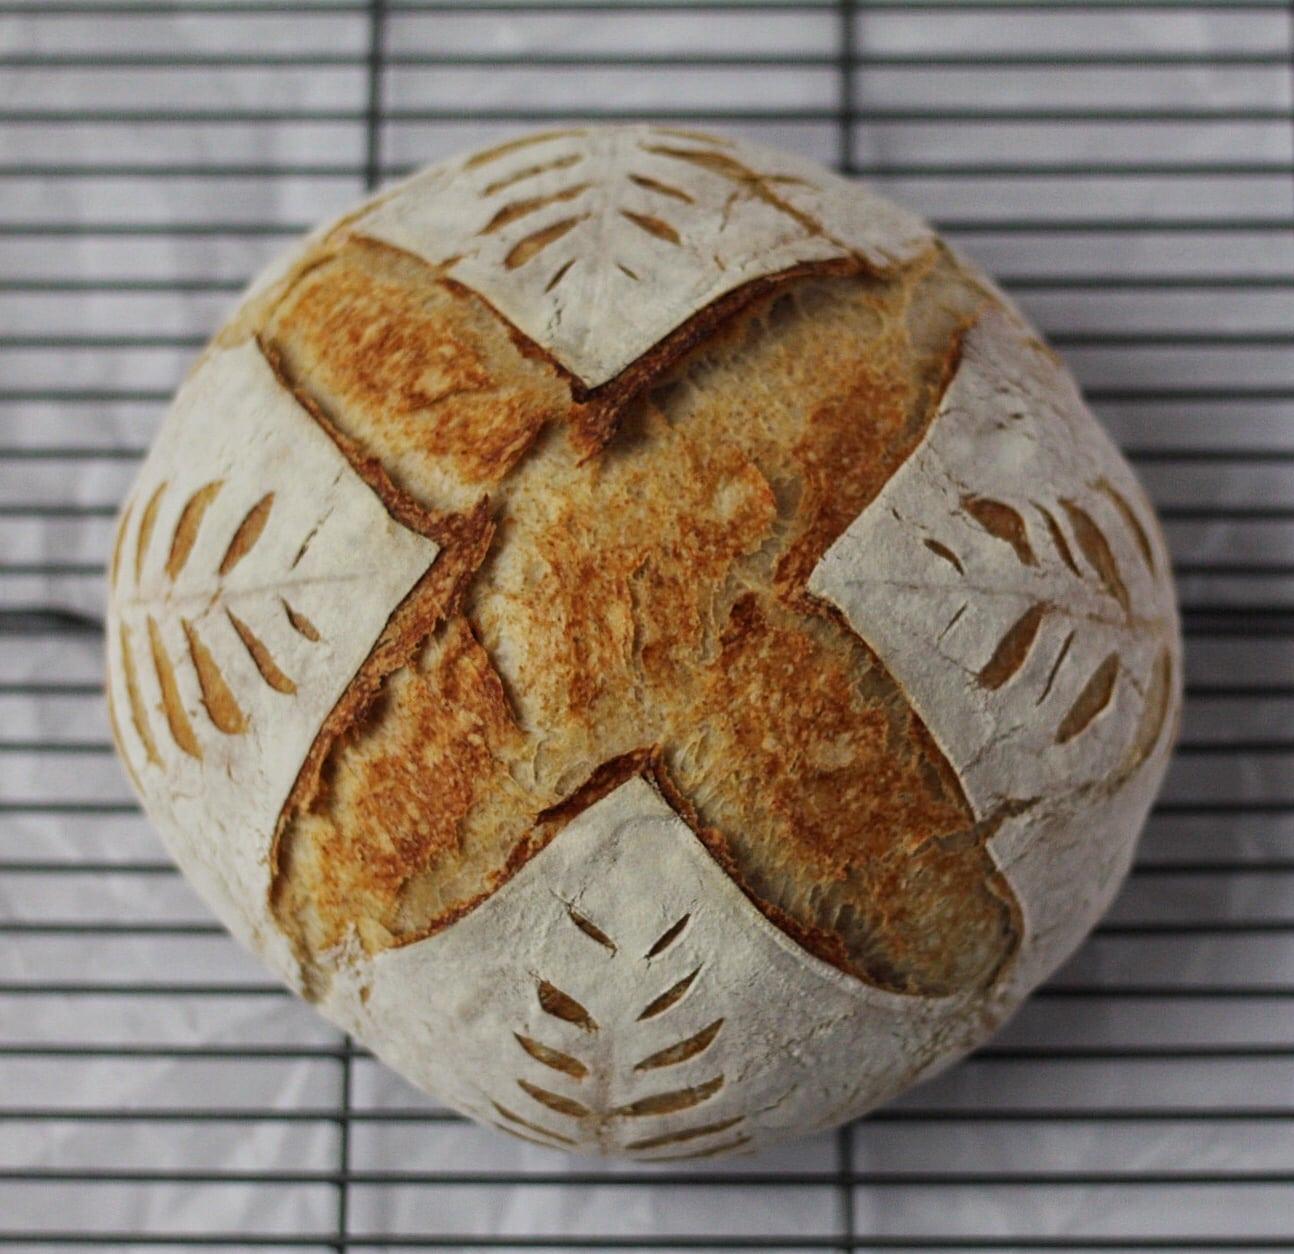 sourdough bread with intricate scoring design